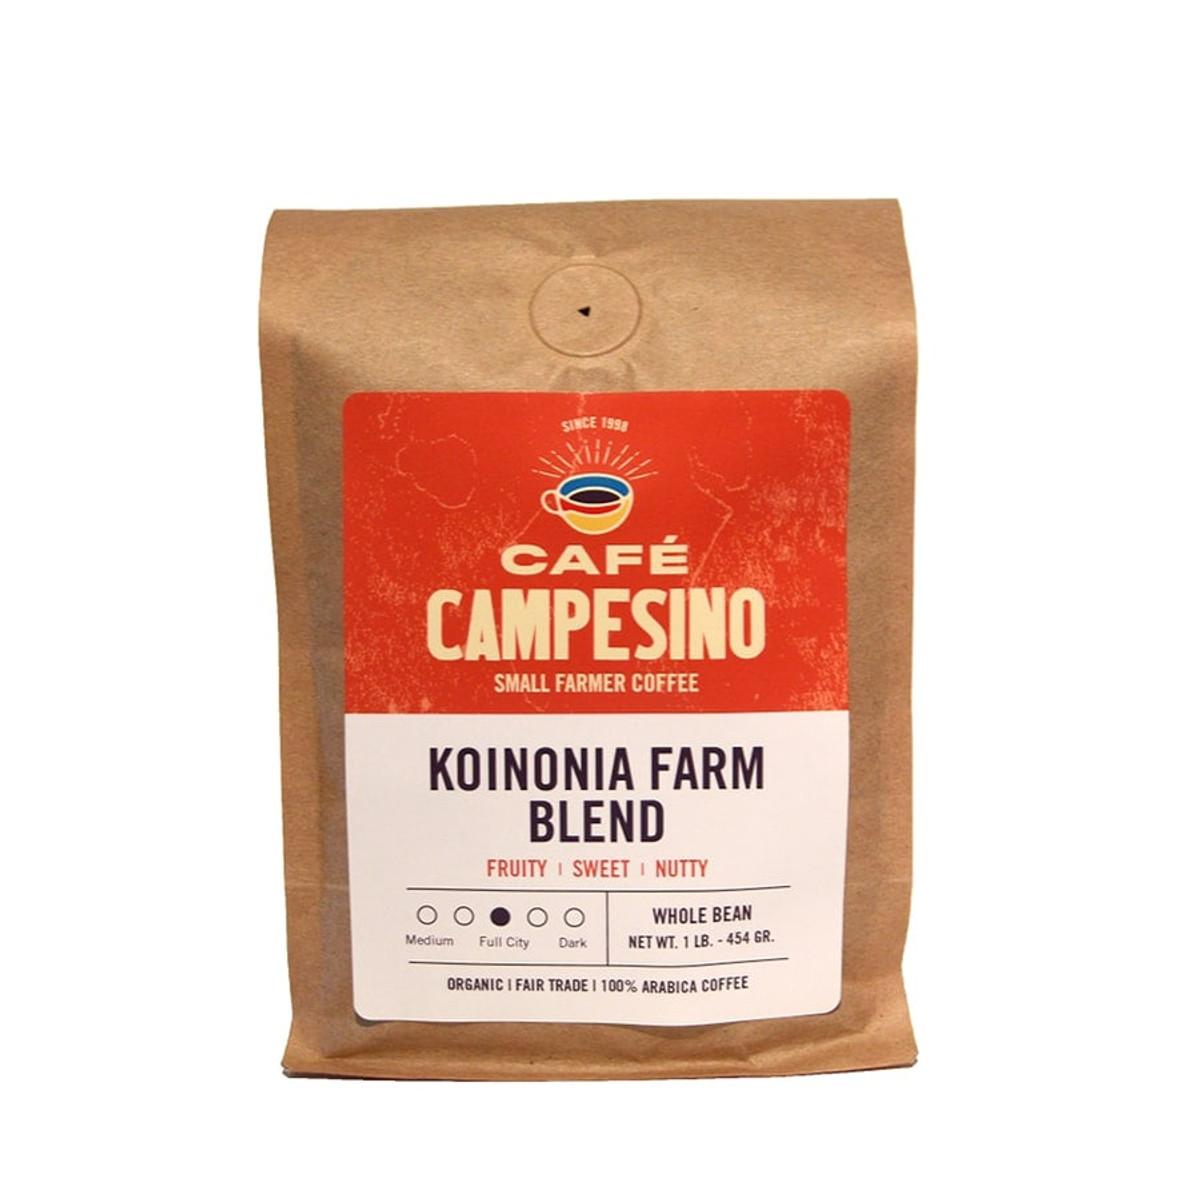 Koinonia Farm coffee blend is fair trade, organic and delightfully well balanced.